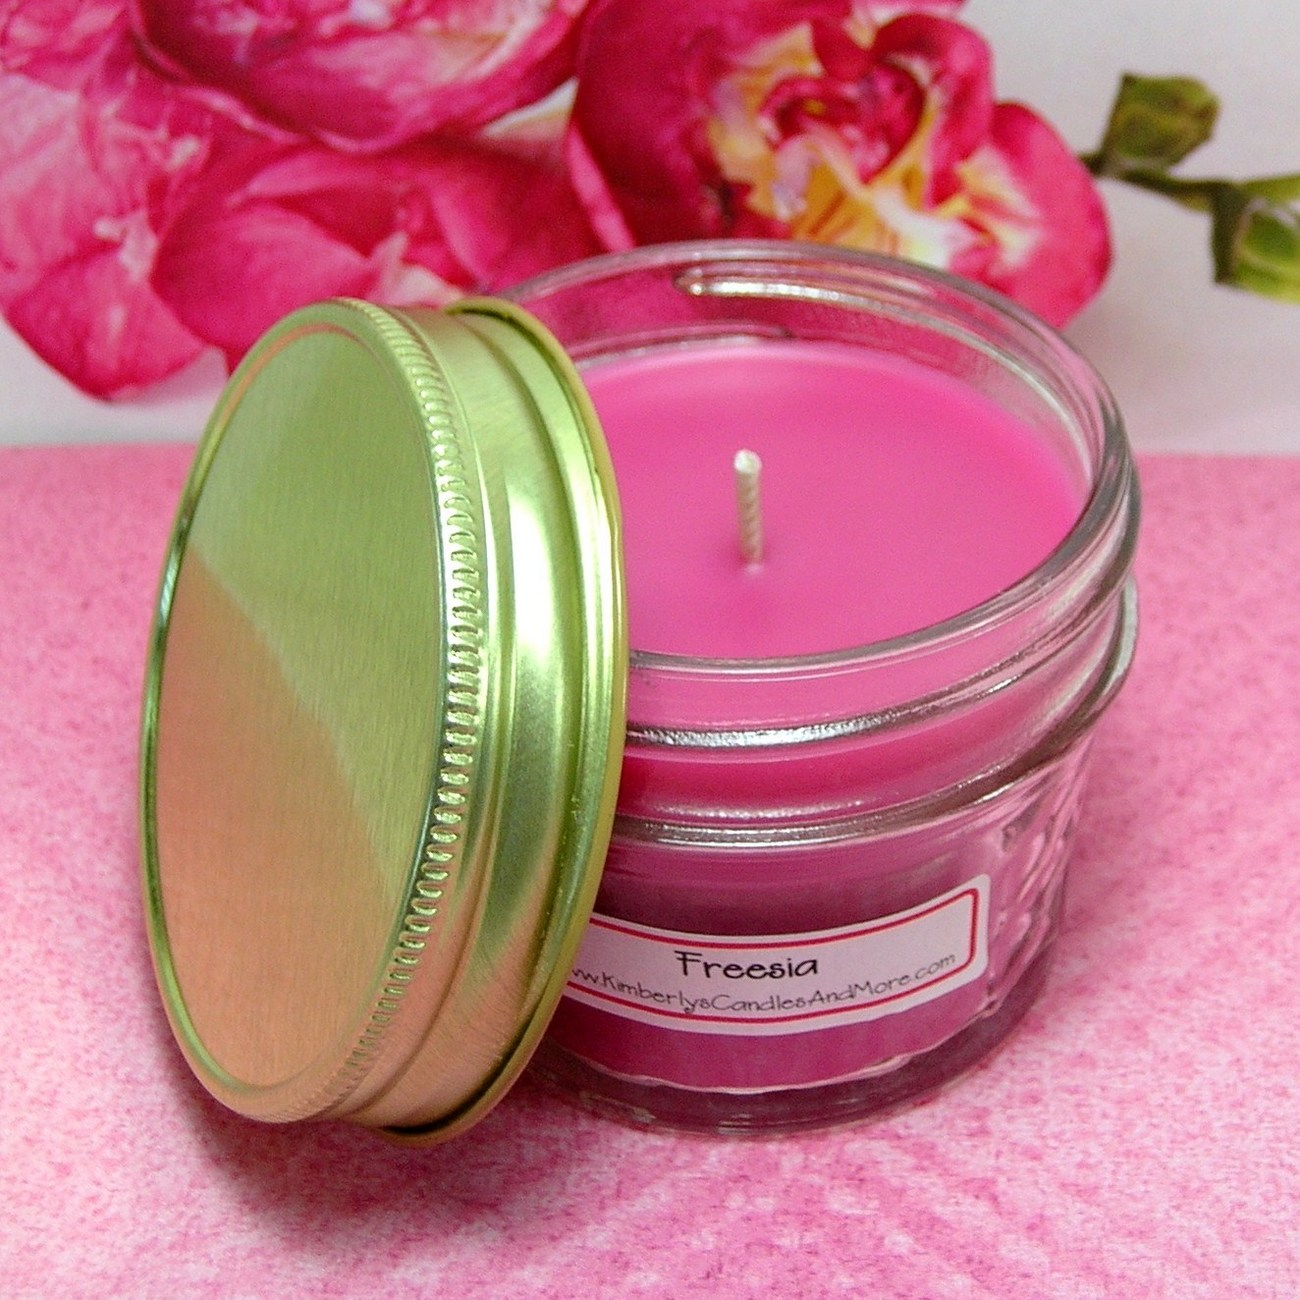 Freesia  4 oz Jelly Jar Candle